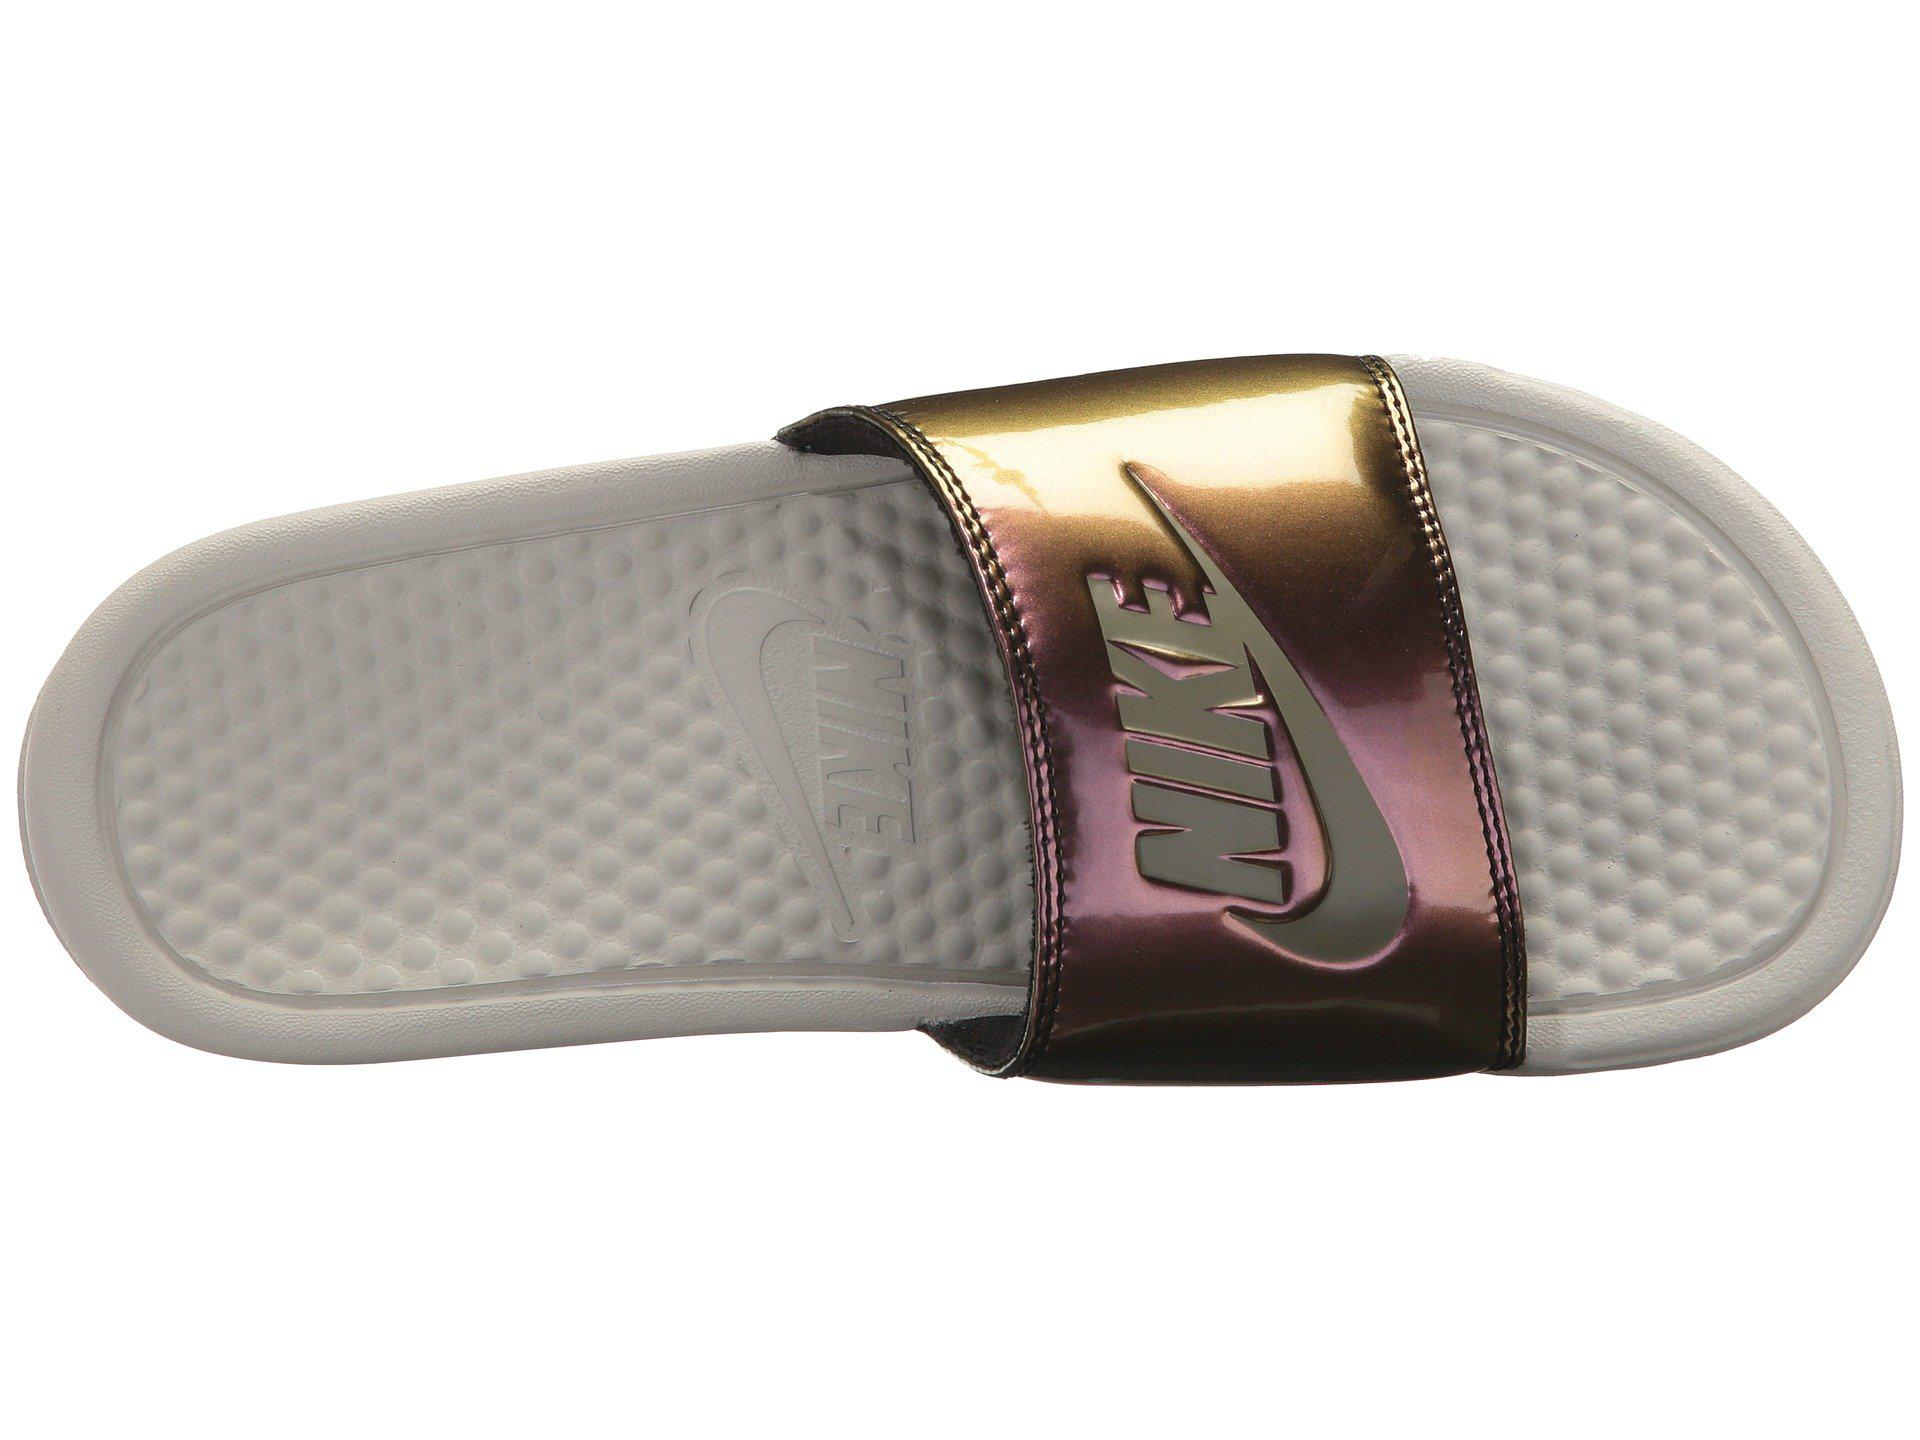 a295bd44645e Lyst - Nike Benassi Jdi - Iridescent